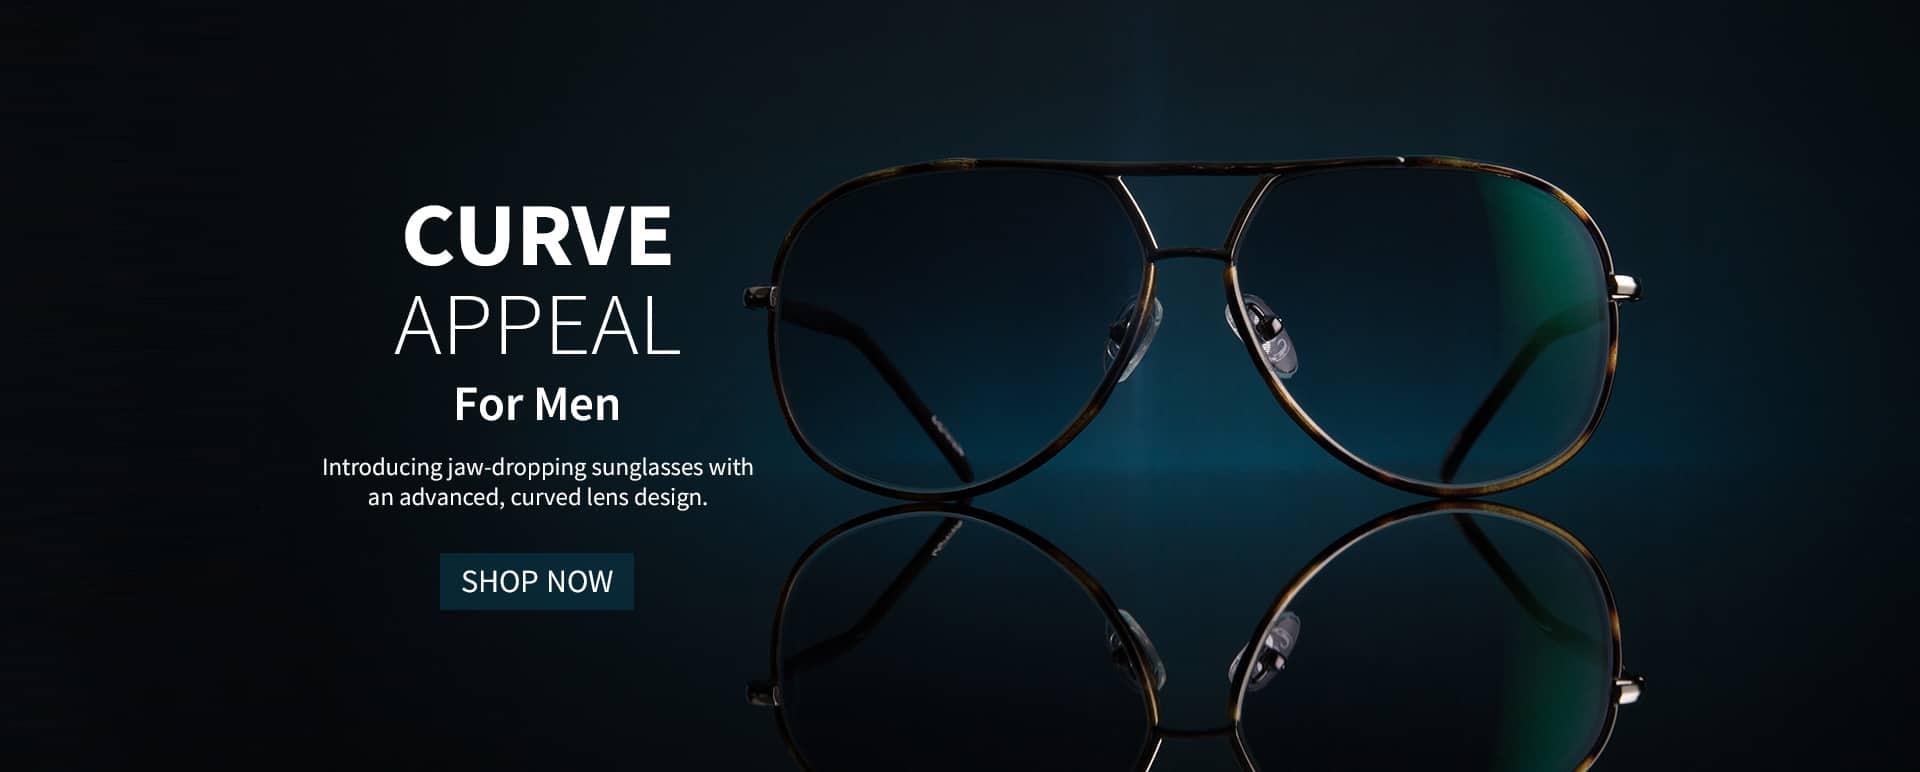 Premium Sunglasses For Men | Zenni Optical